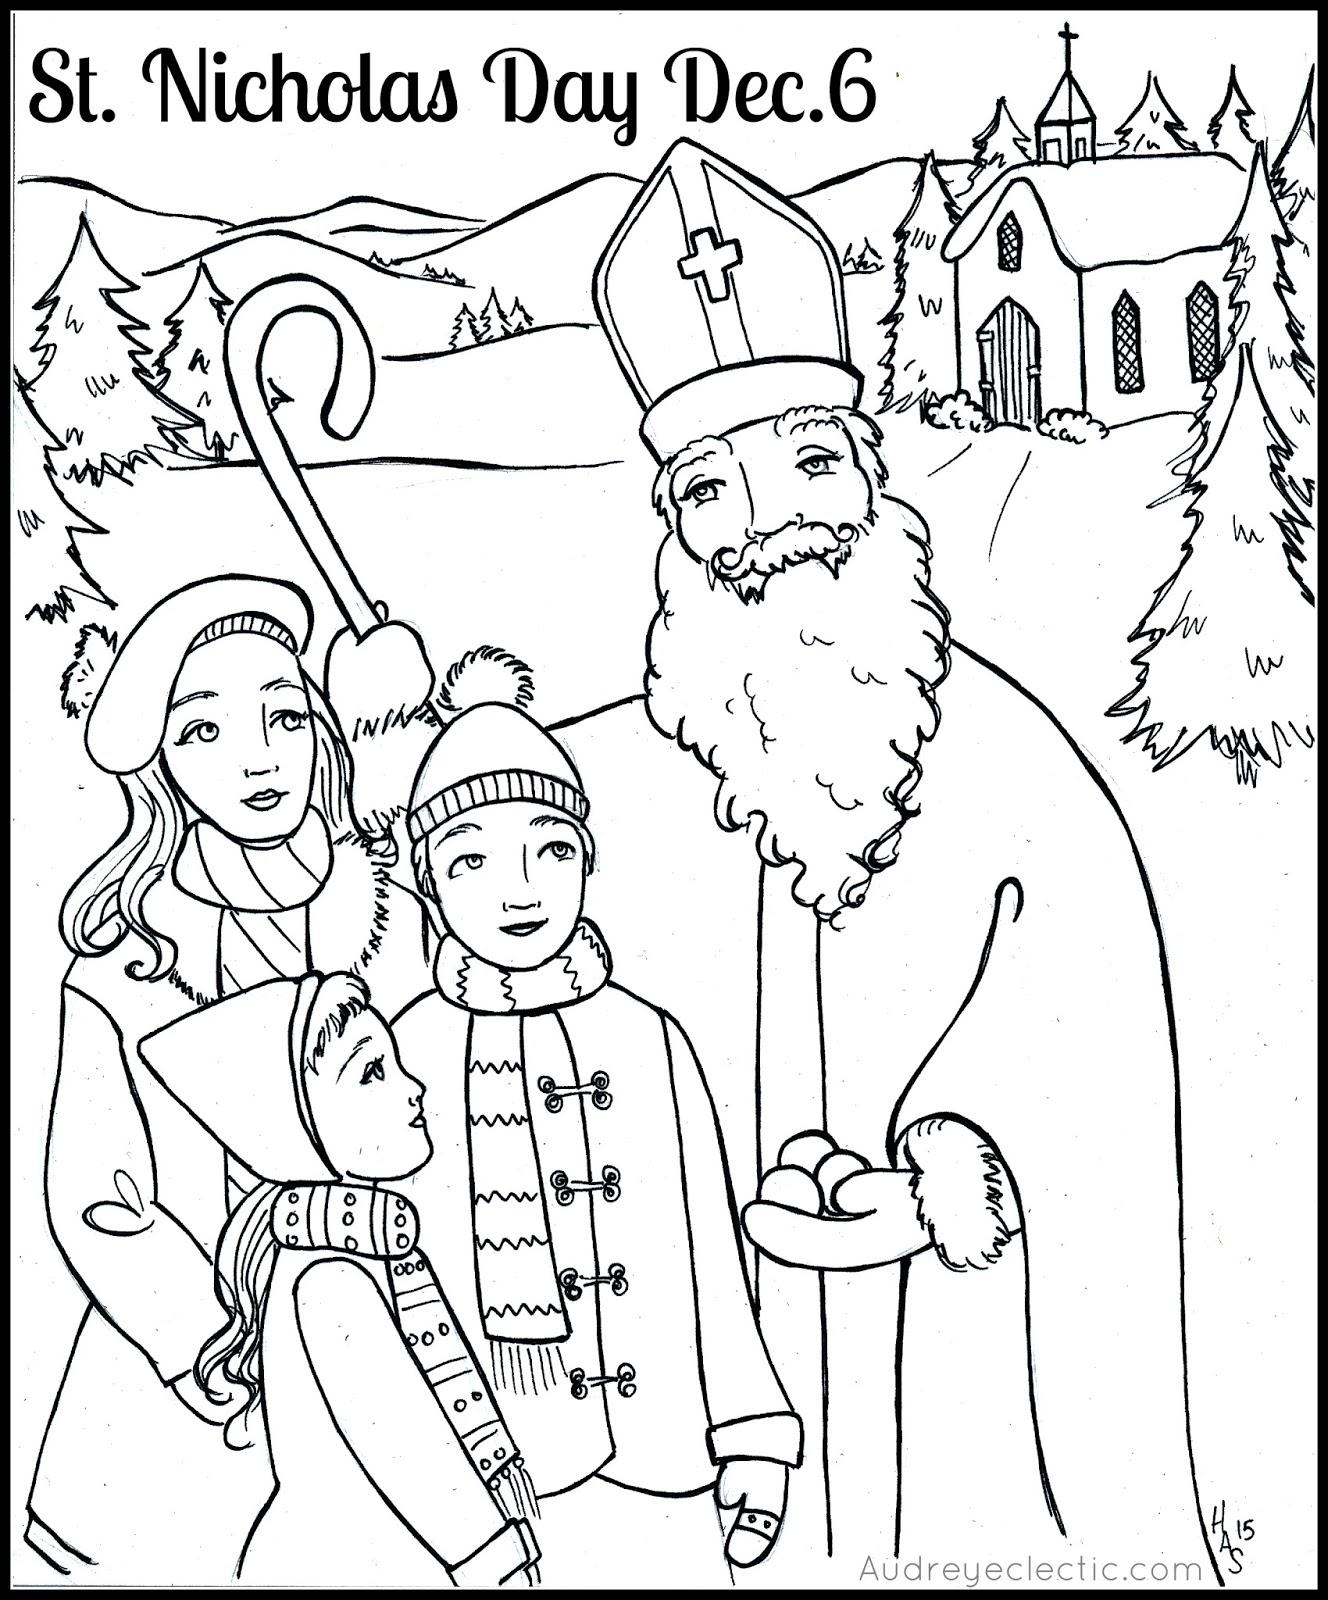 Saint nicholas day coloring pages coloring pages for St nicholas coloring pages